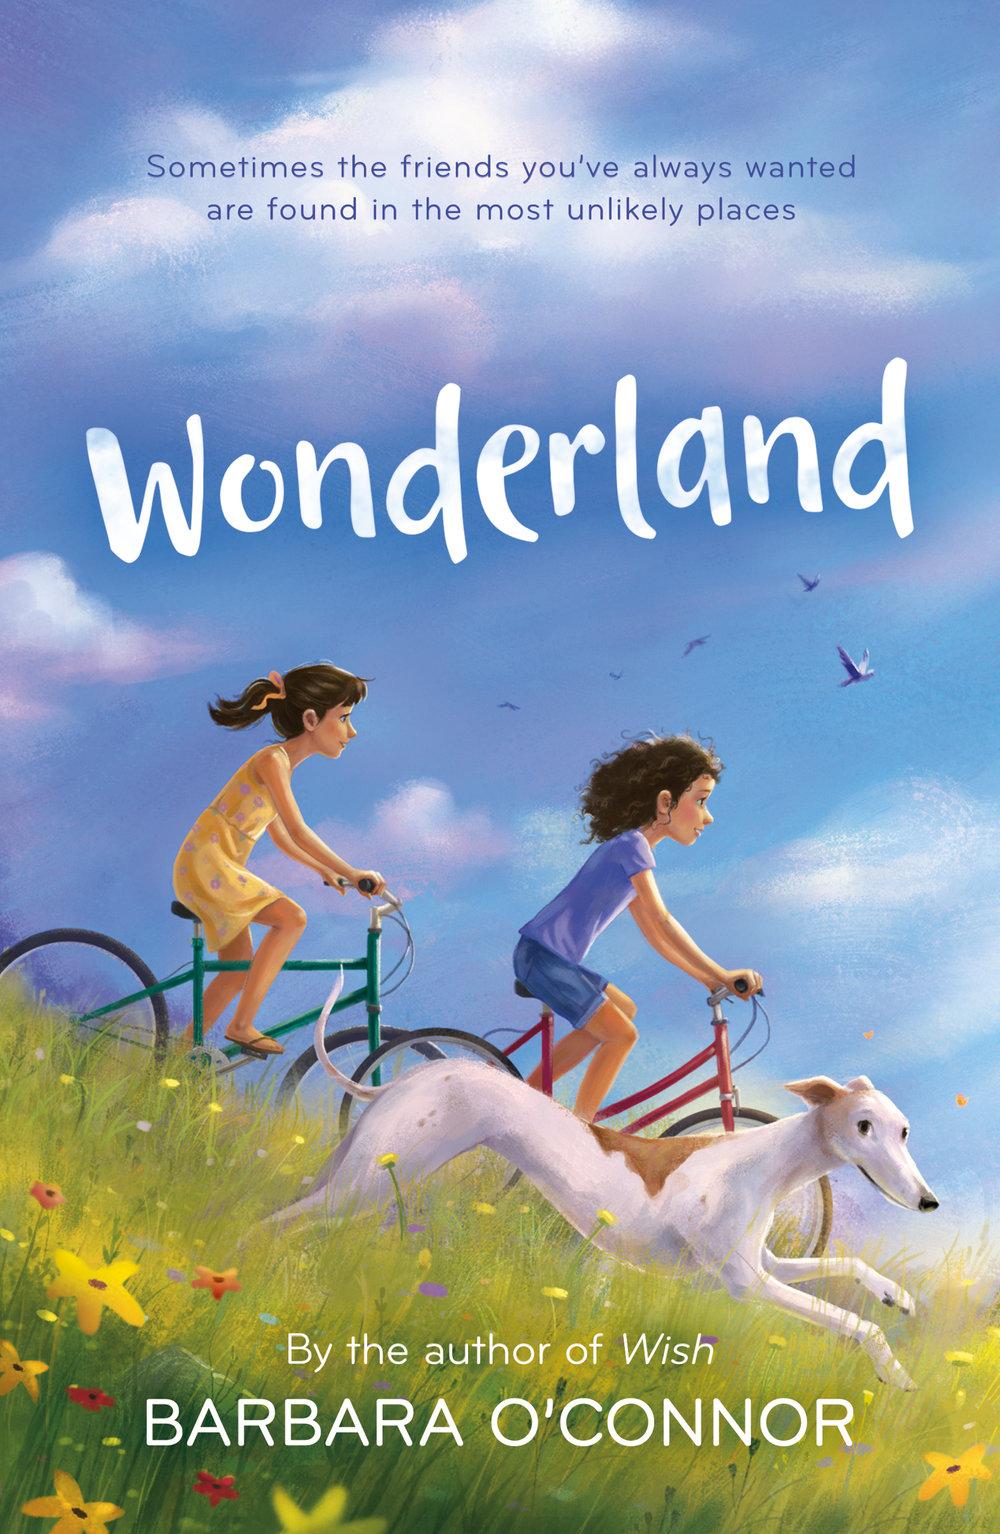 Wonderland , Barbara O'Connor  For Farrar, Straus and Giroux BYR. Illustration by  Jen Bricking .